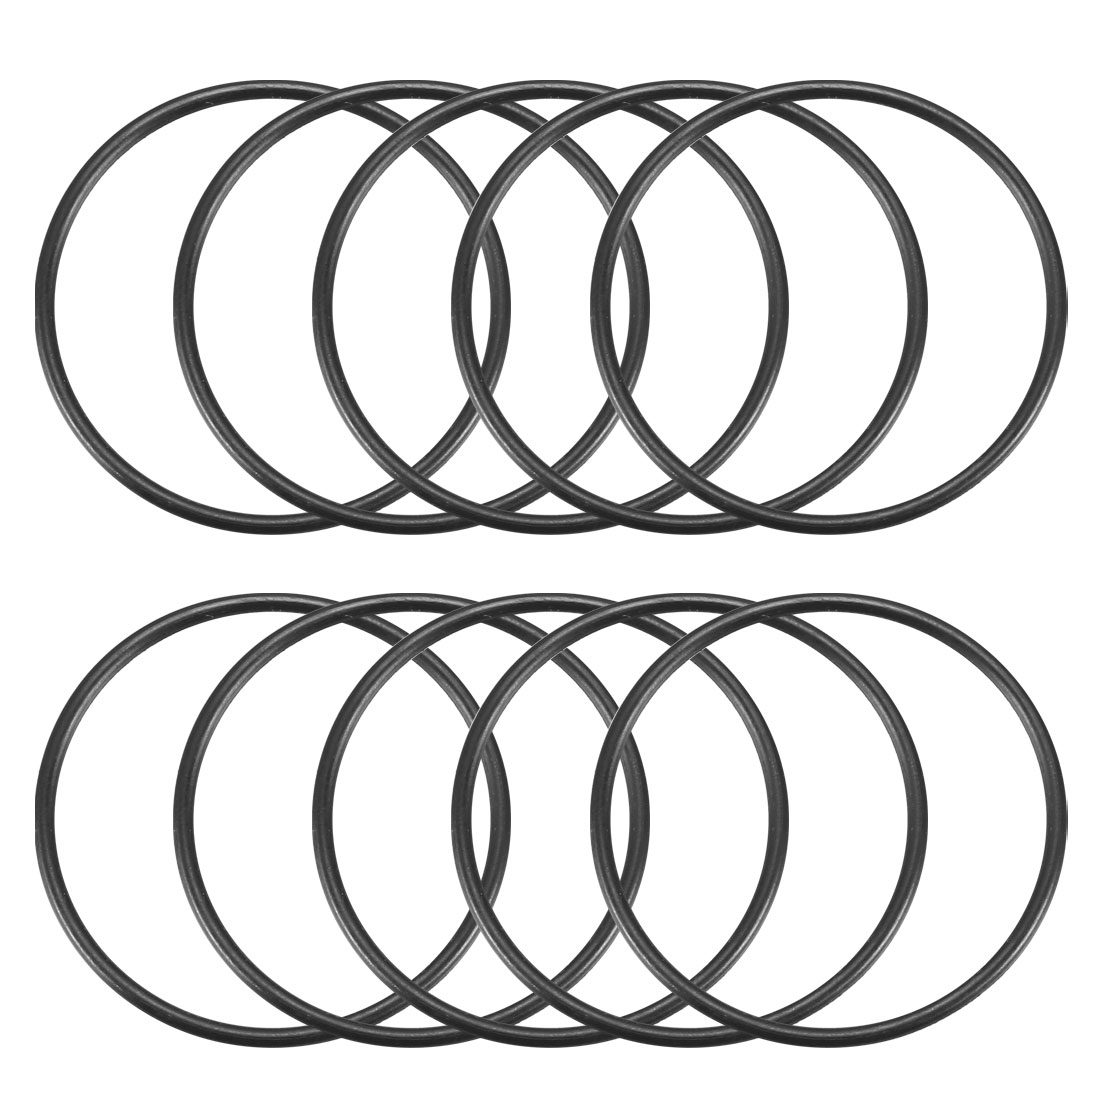 10 Pcs Black 33mm x 1.5mm Nitrile Rubber O Ring NBR Oil Sealing Grommets